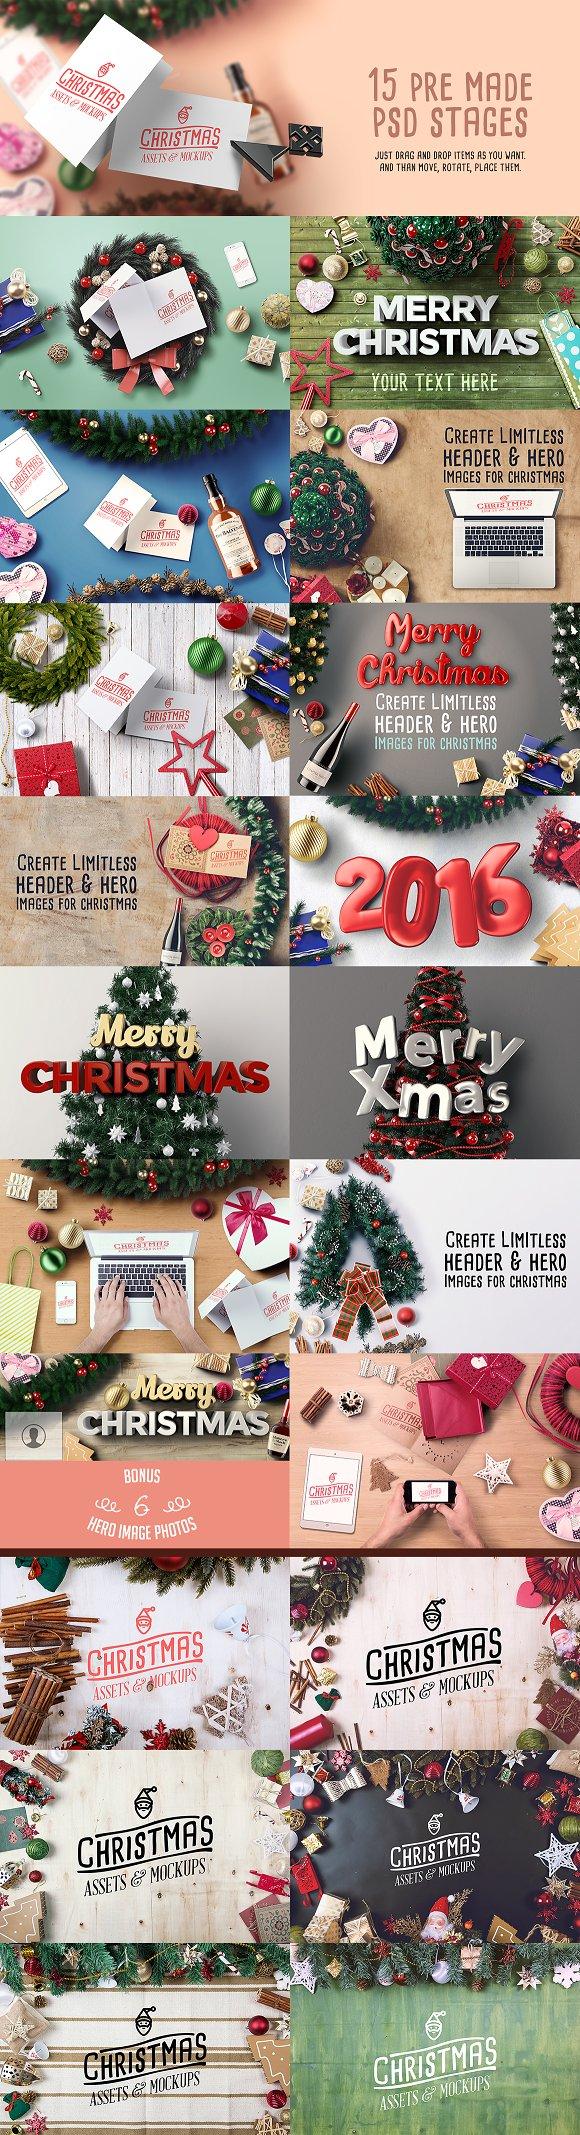 Christmas Assets & Mock Ups ~ Product Mockups ~ Creative Market